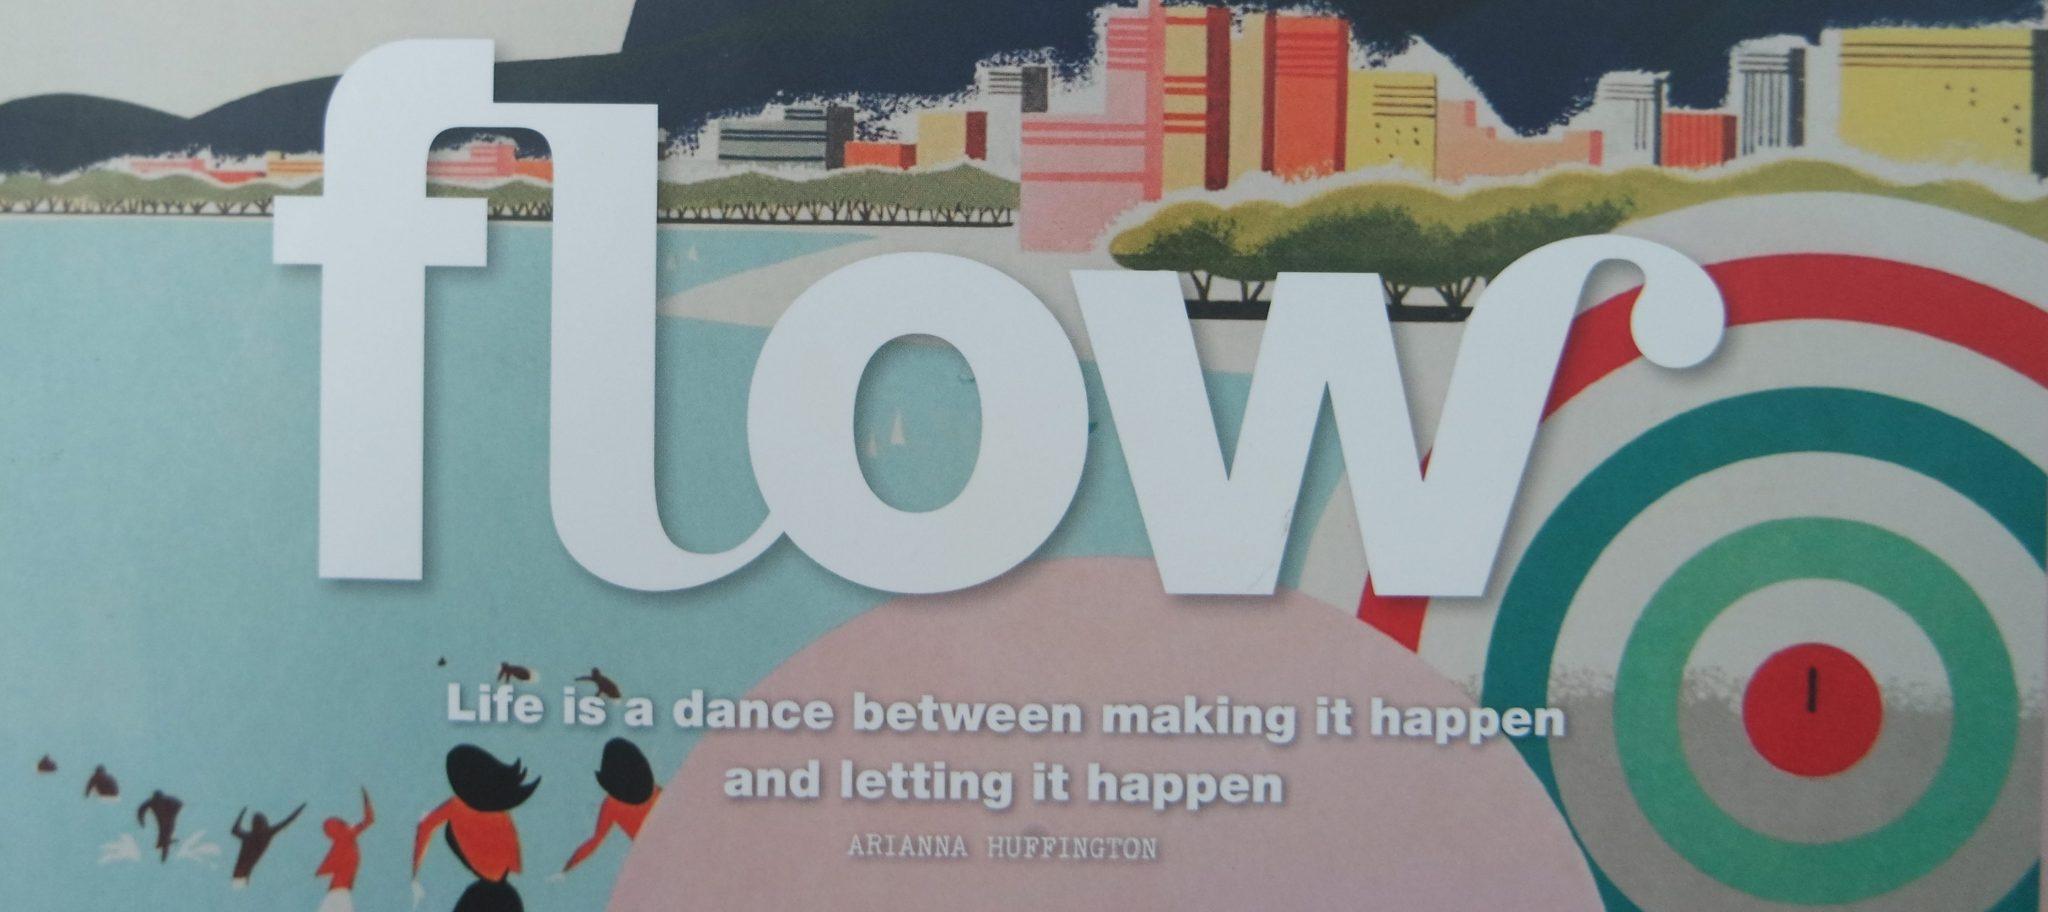 flow magazine workflow back to work